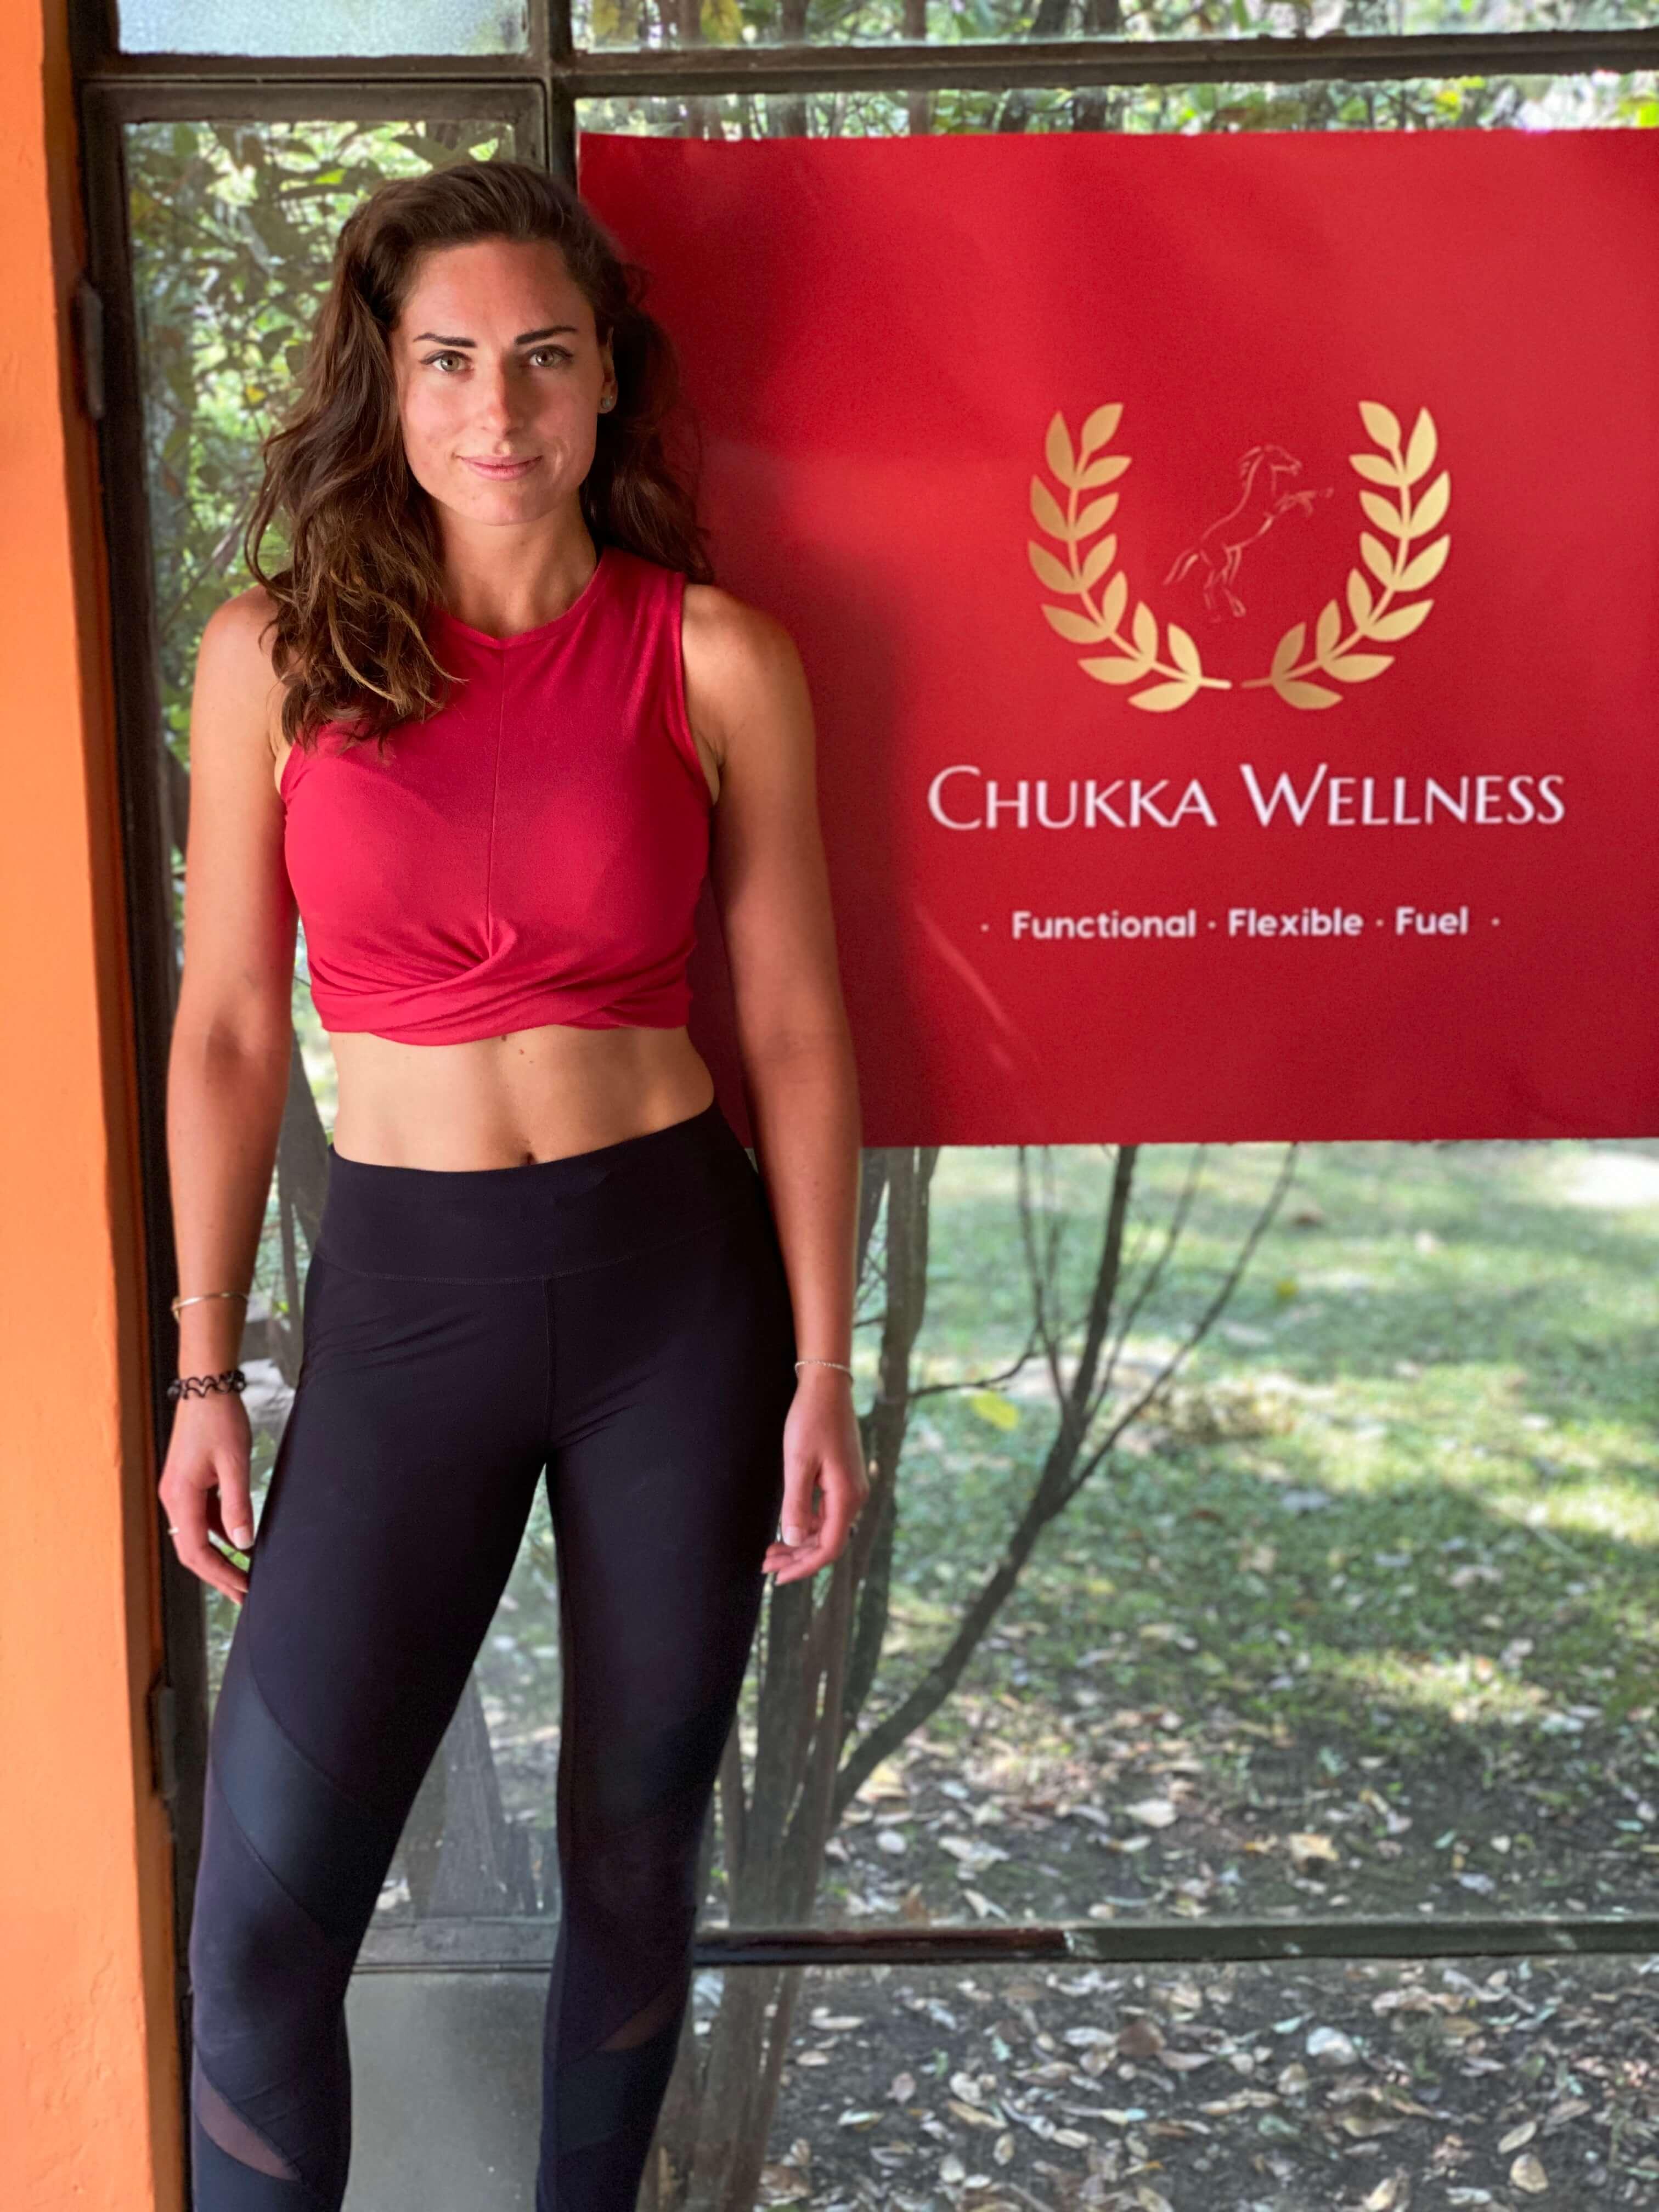 Chukka Wellness